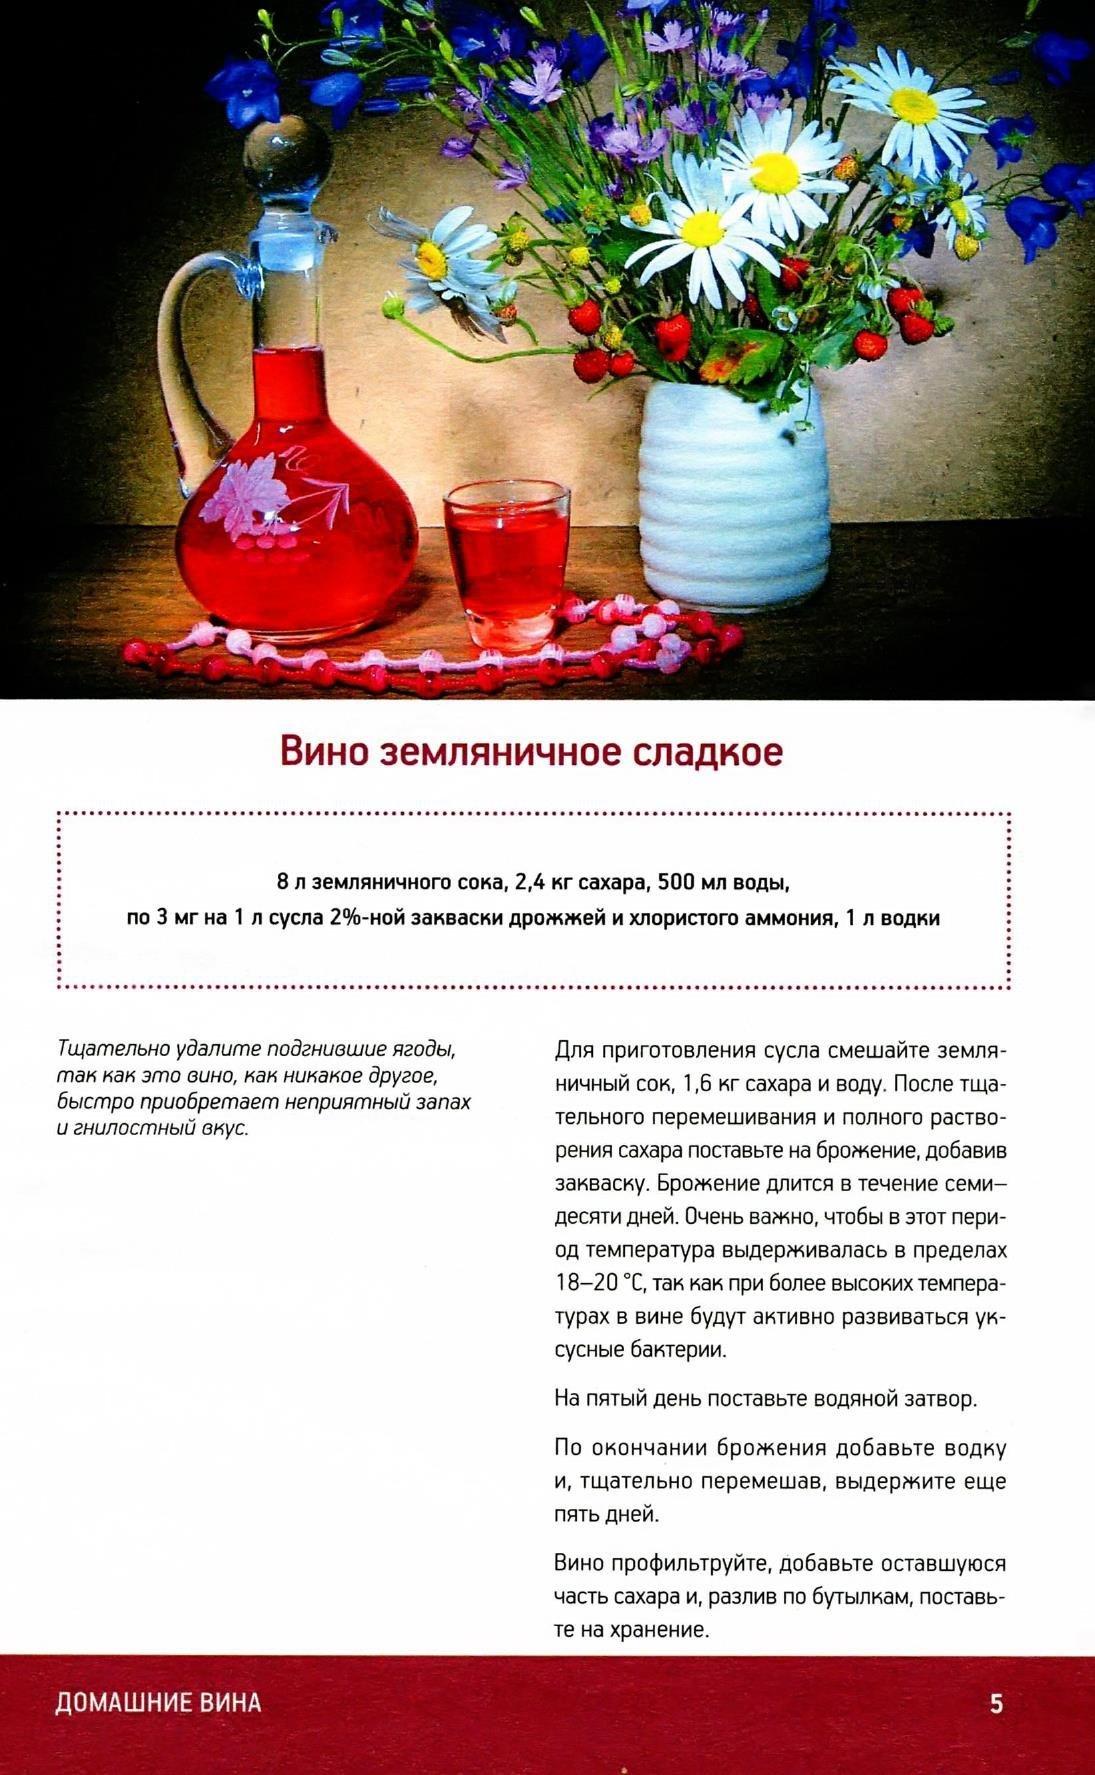 http://images.vfl.ru/ii/1407525356/f34f2544/5940193.jpg